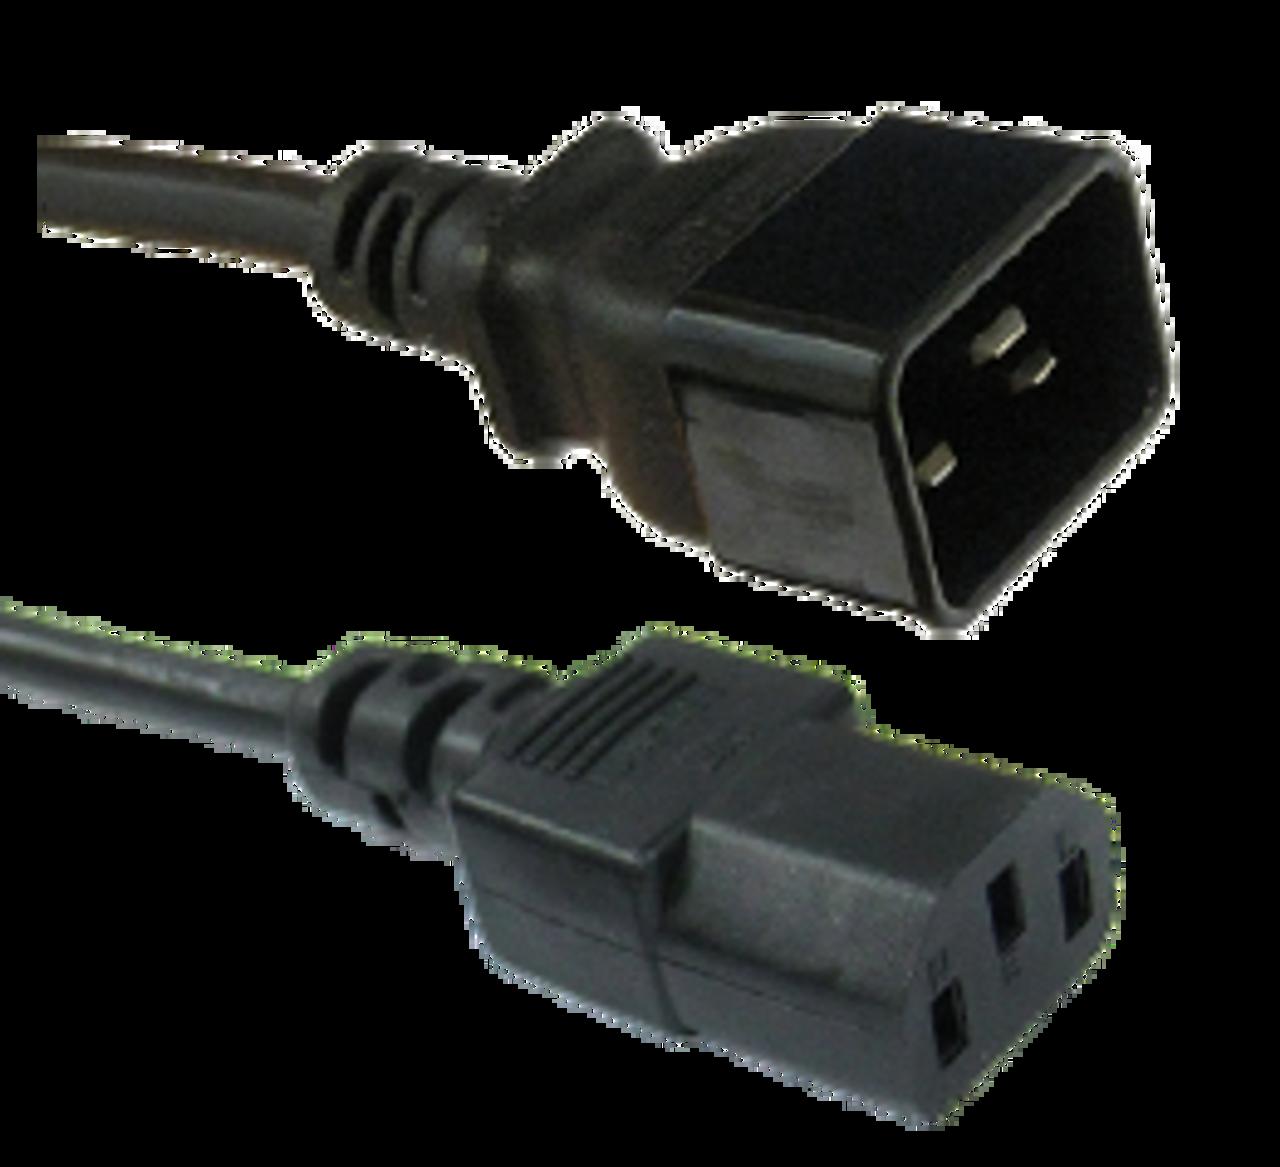 IEC C20 16A plug - IEC C13 10A socket, black lead (1.5mm2)